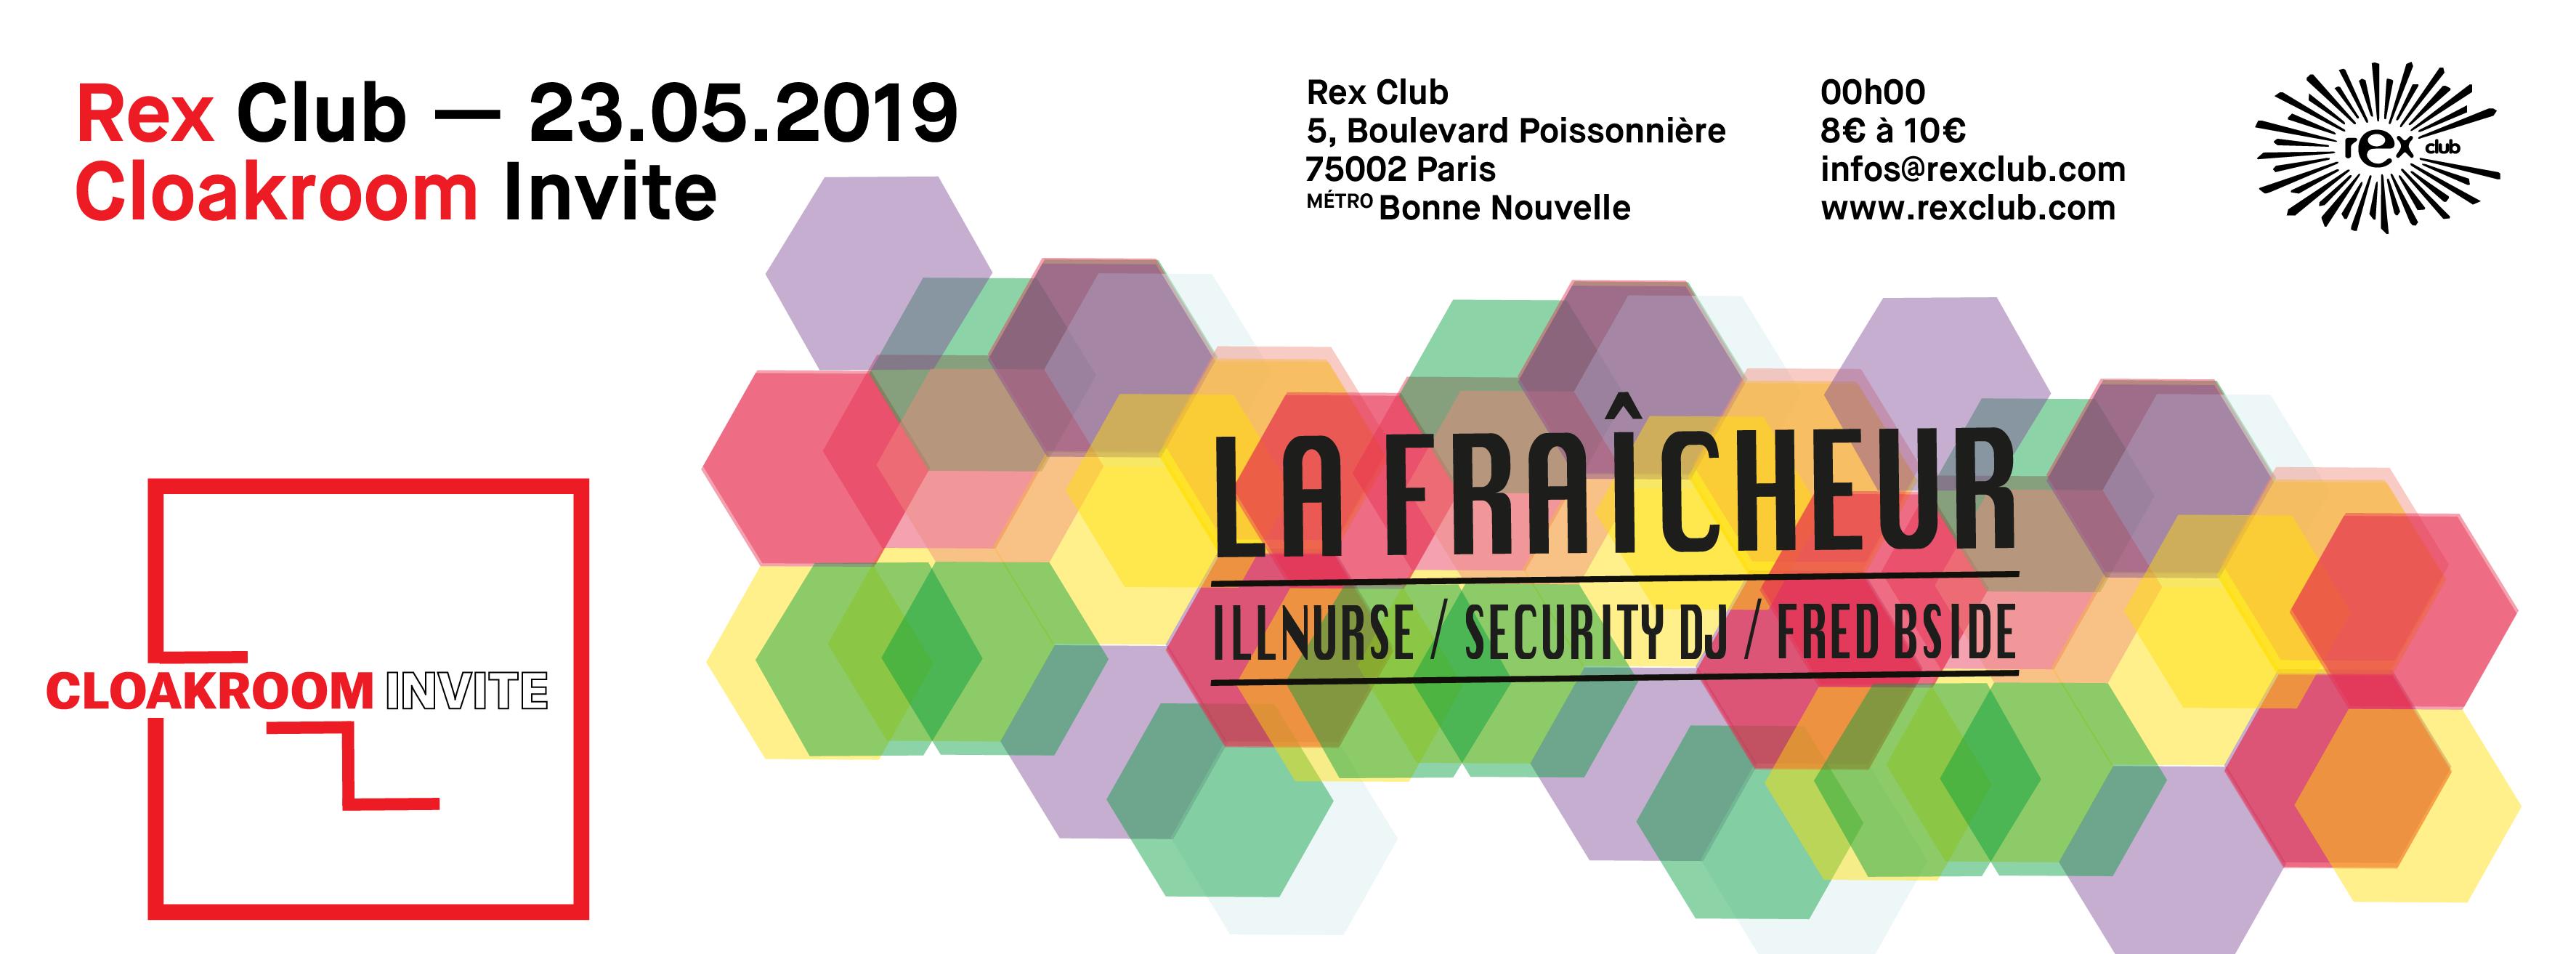 Cloakroom Invite La Fraicheur, Illnurse, Security DJ, Fred Bside